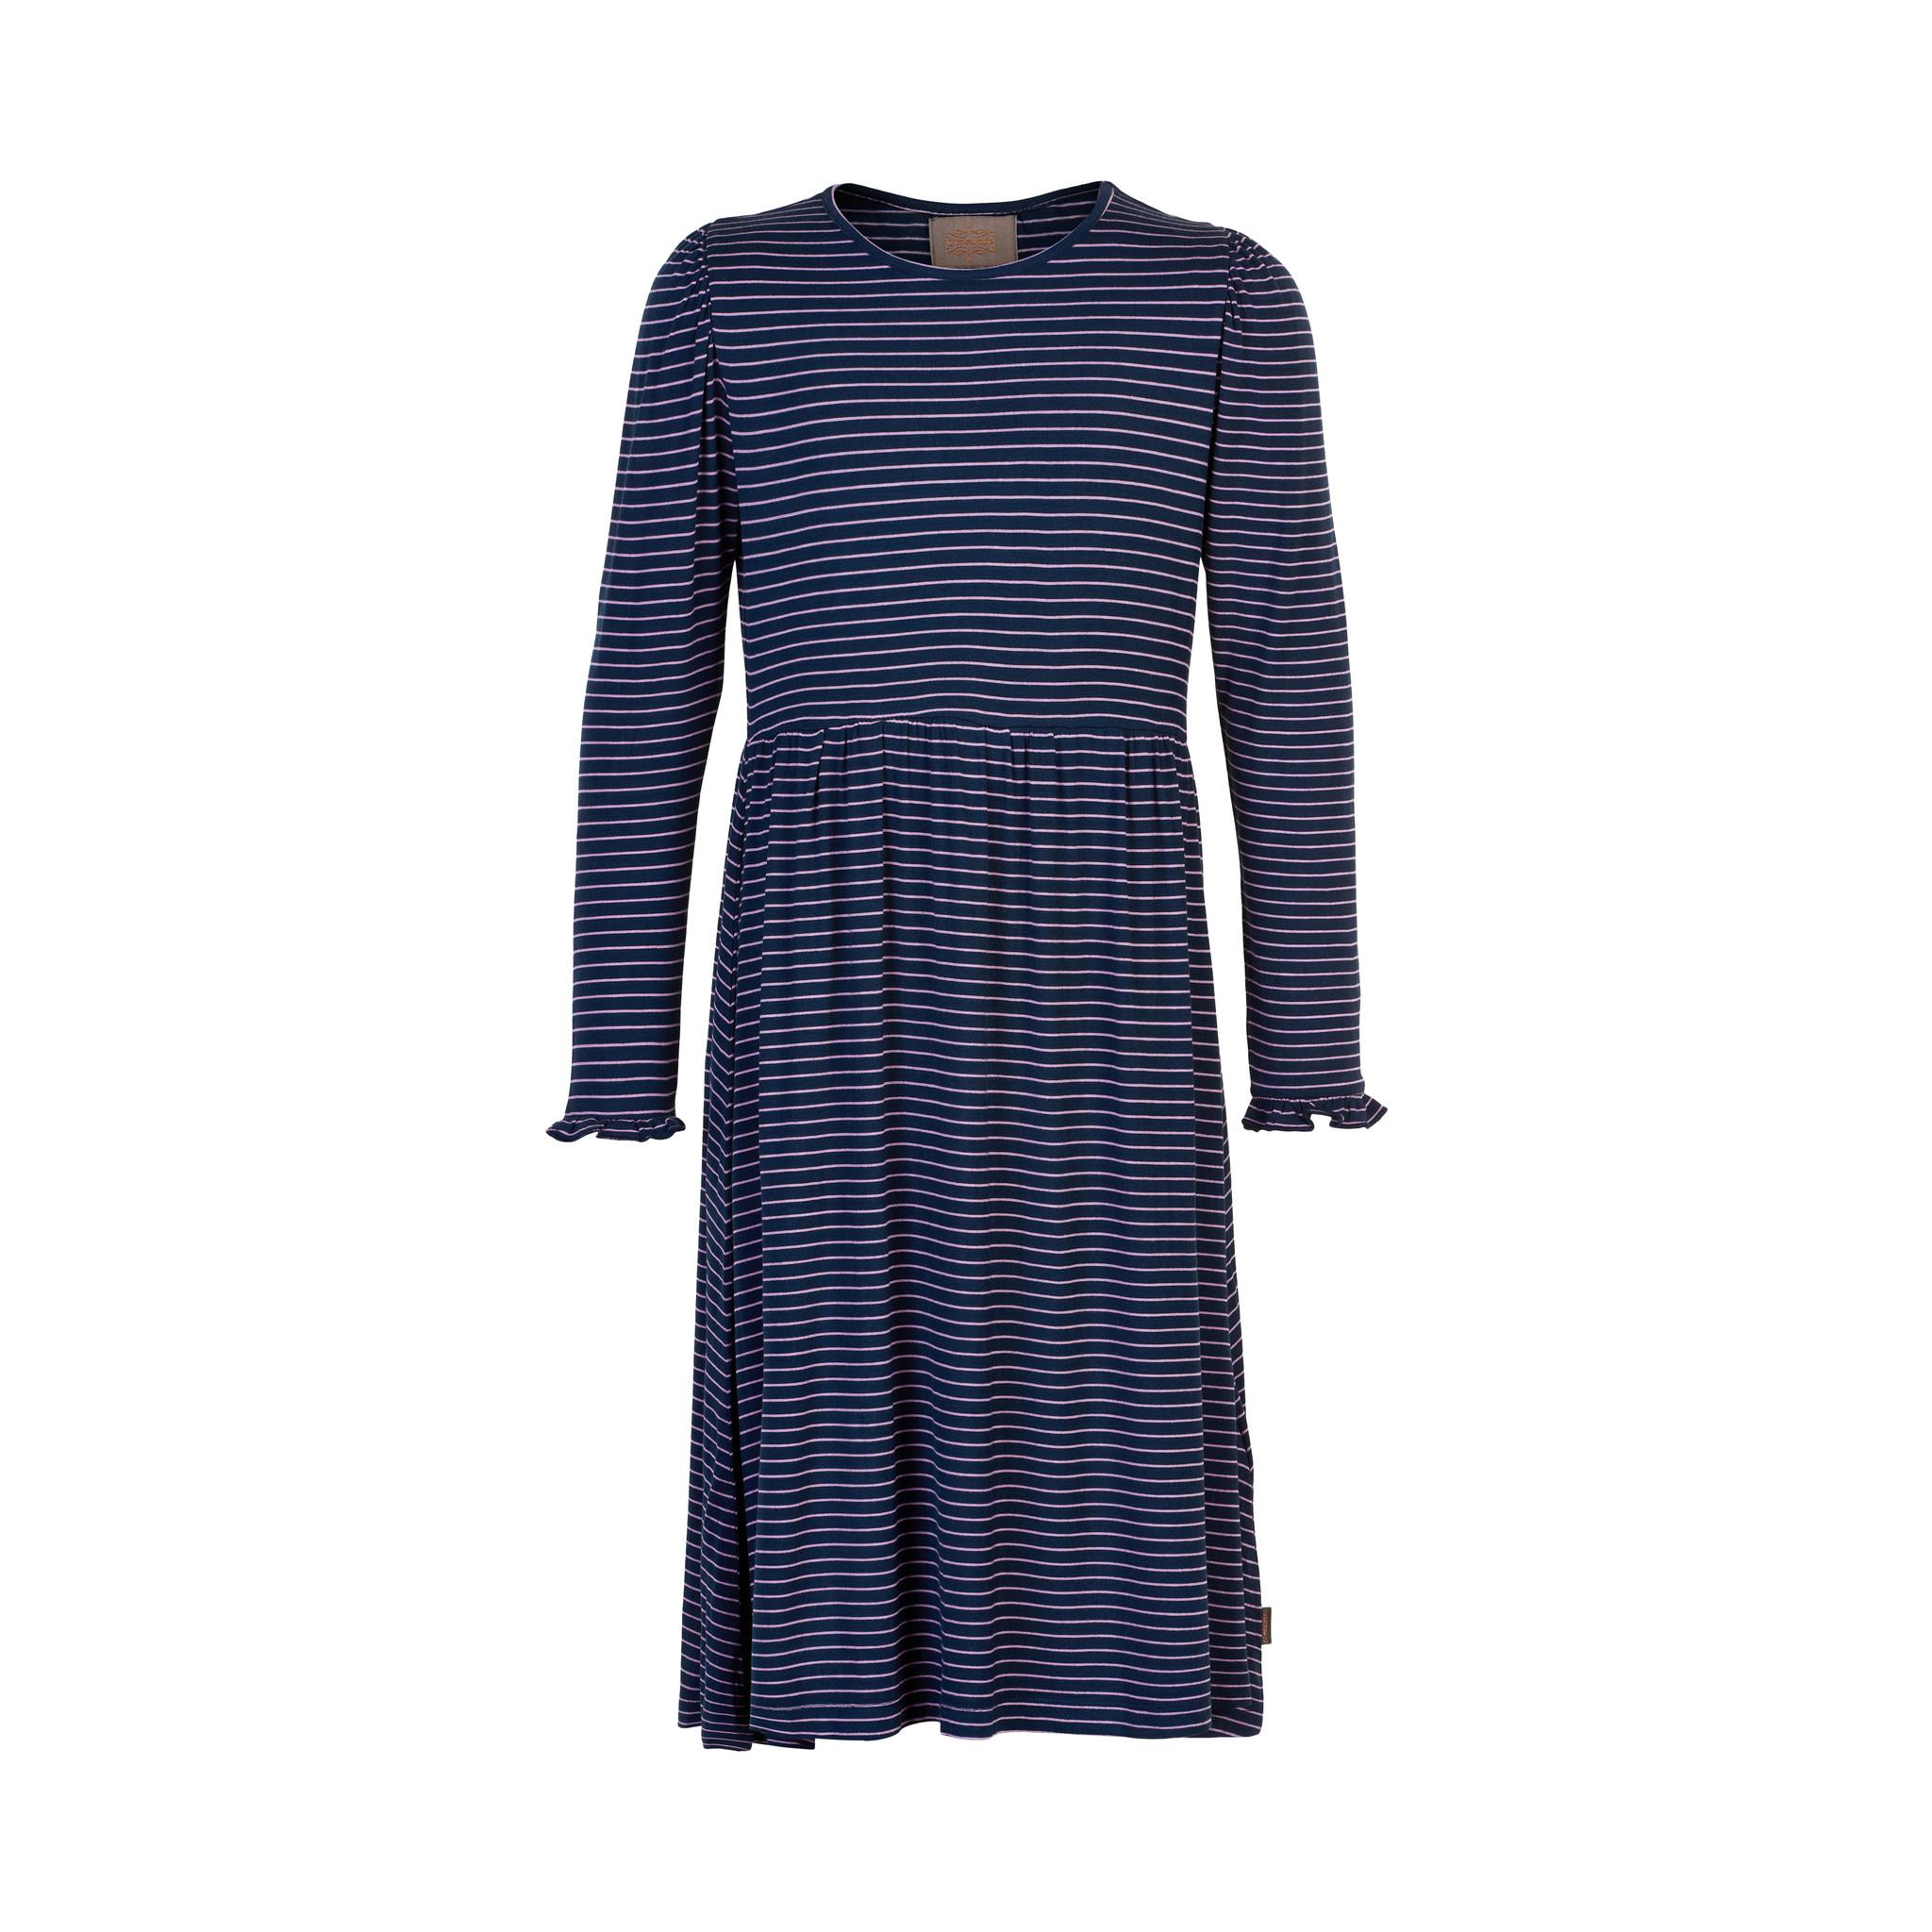 Jersey Dress - Navy and Lilac Stripe